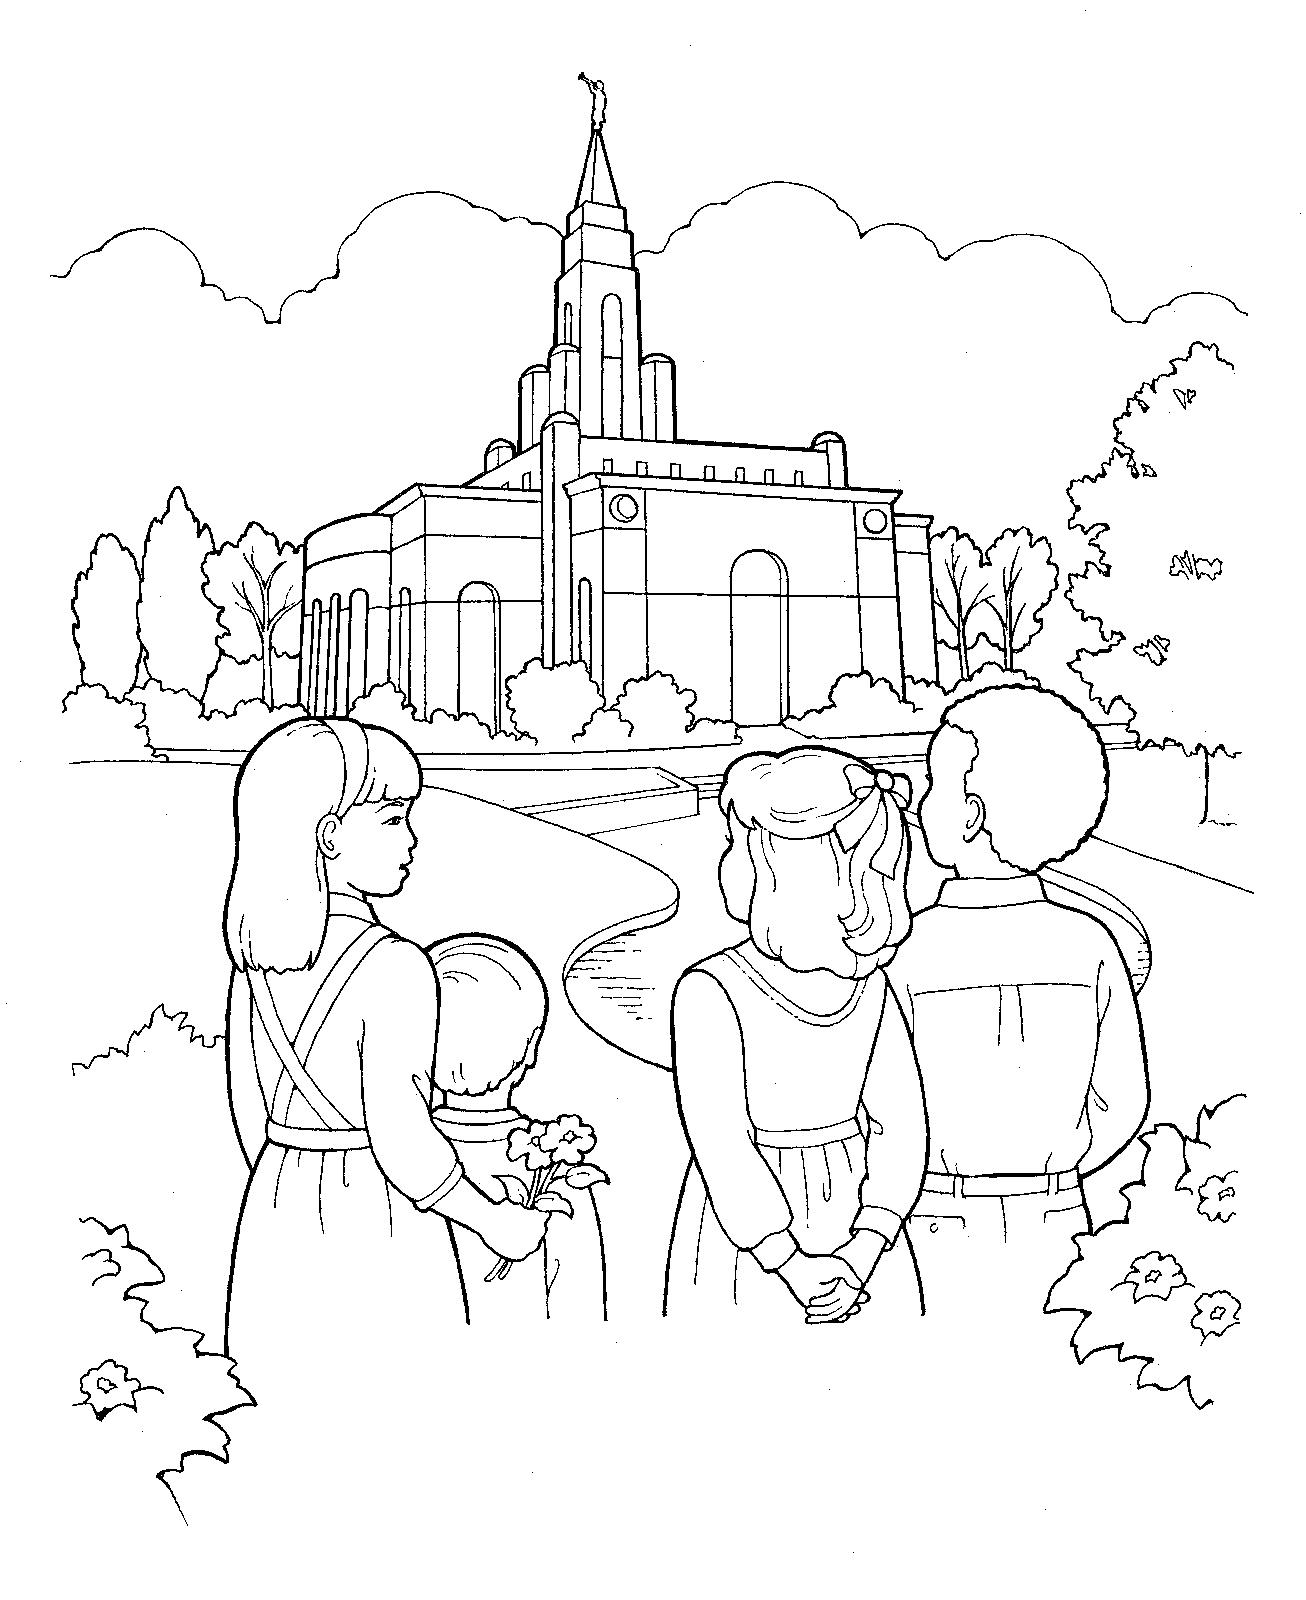 Salt Lake City Temple Drawing at GetDrawings.com | Free for personal ...